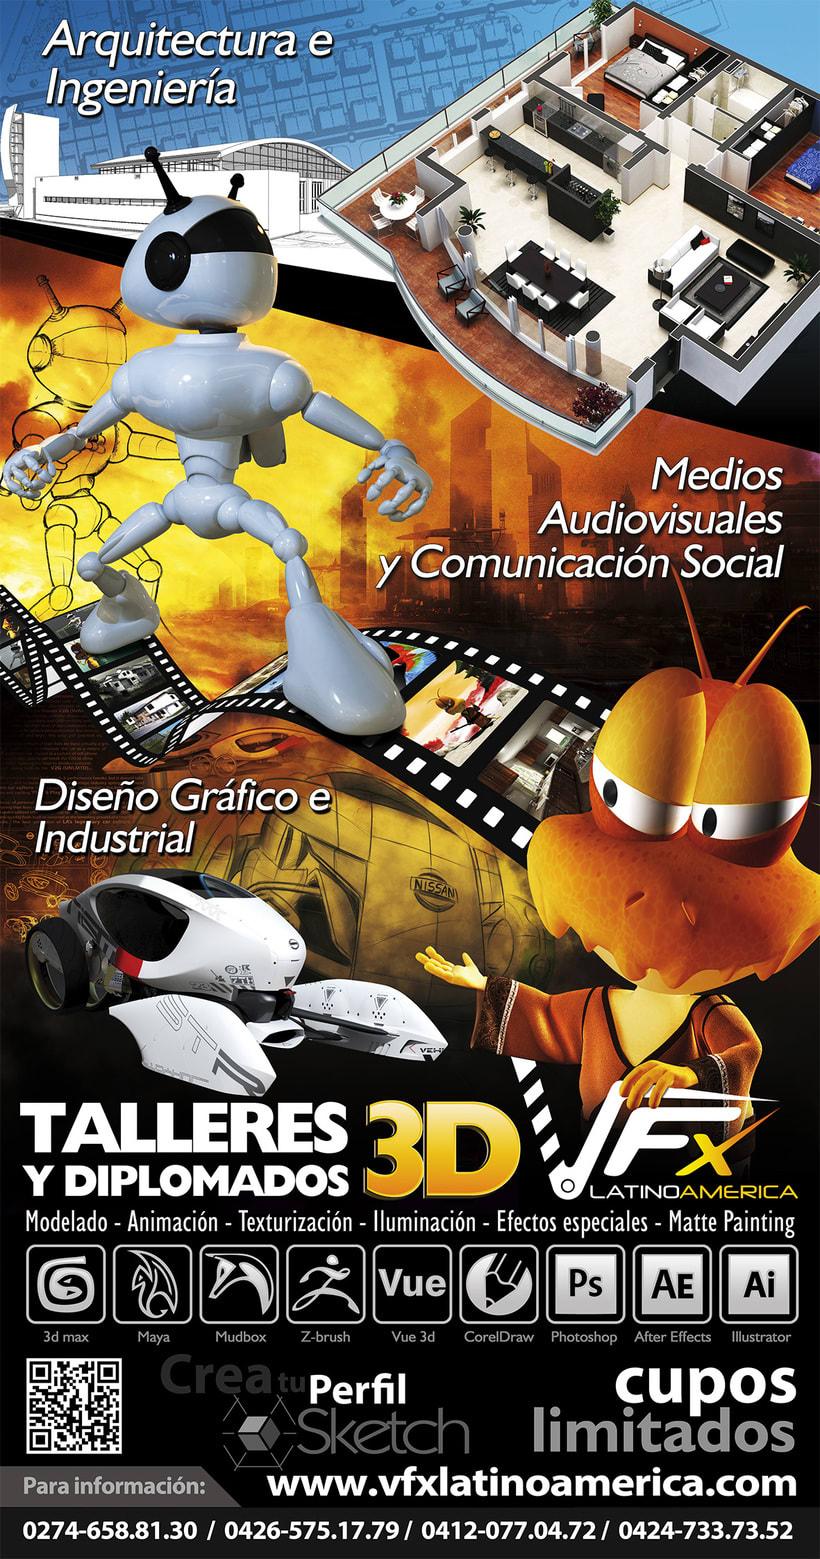 VFX Latinoamerica / talleres y Diplomados 3D 0